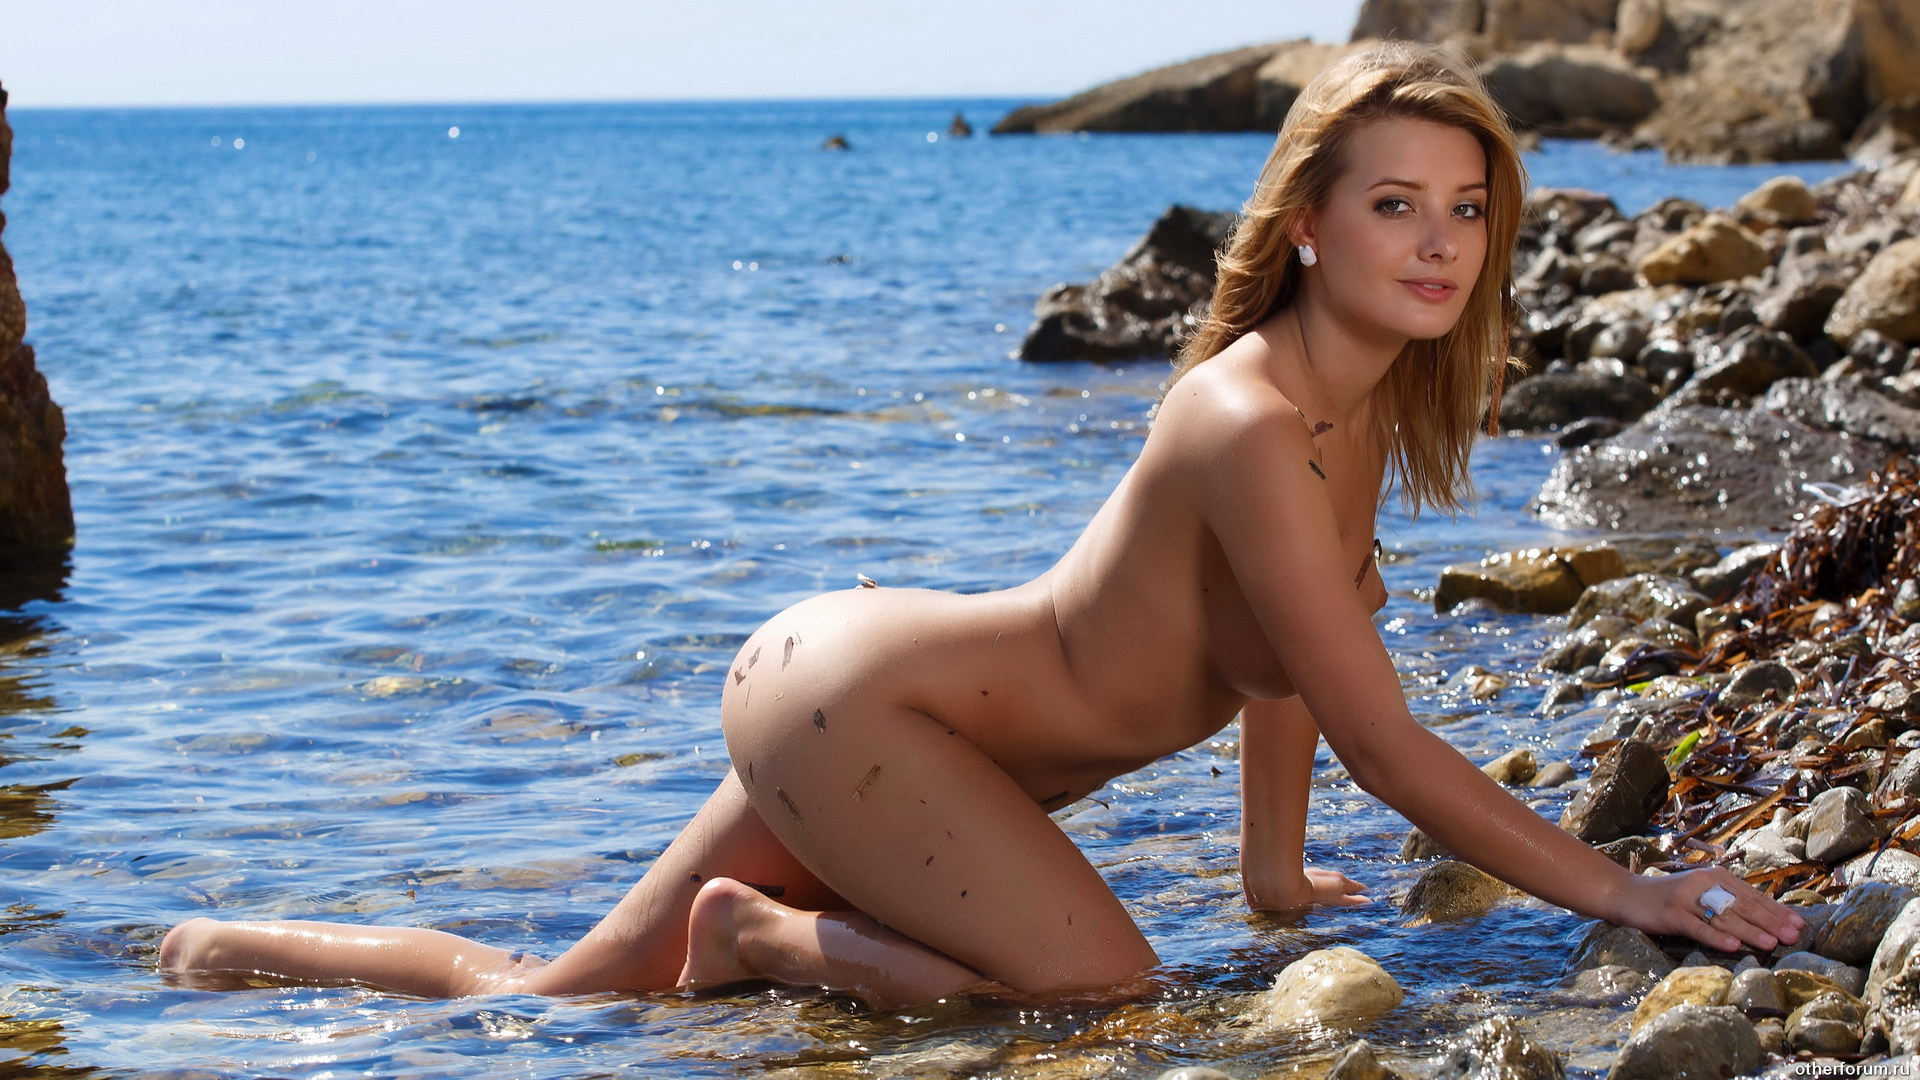 Фото девушек на пляже ххх